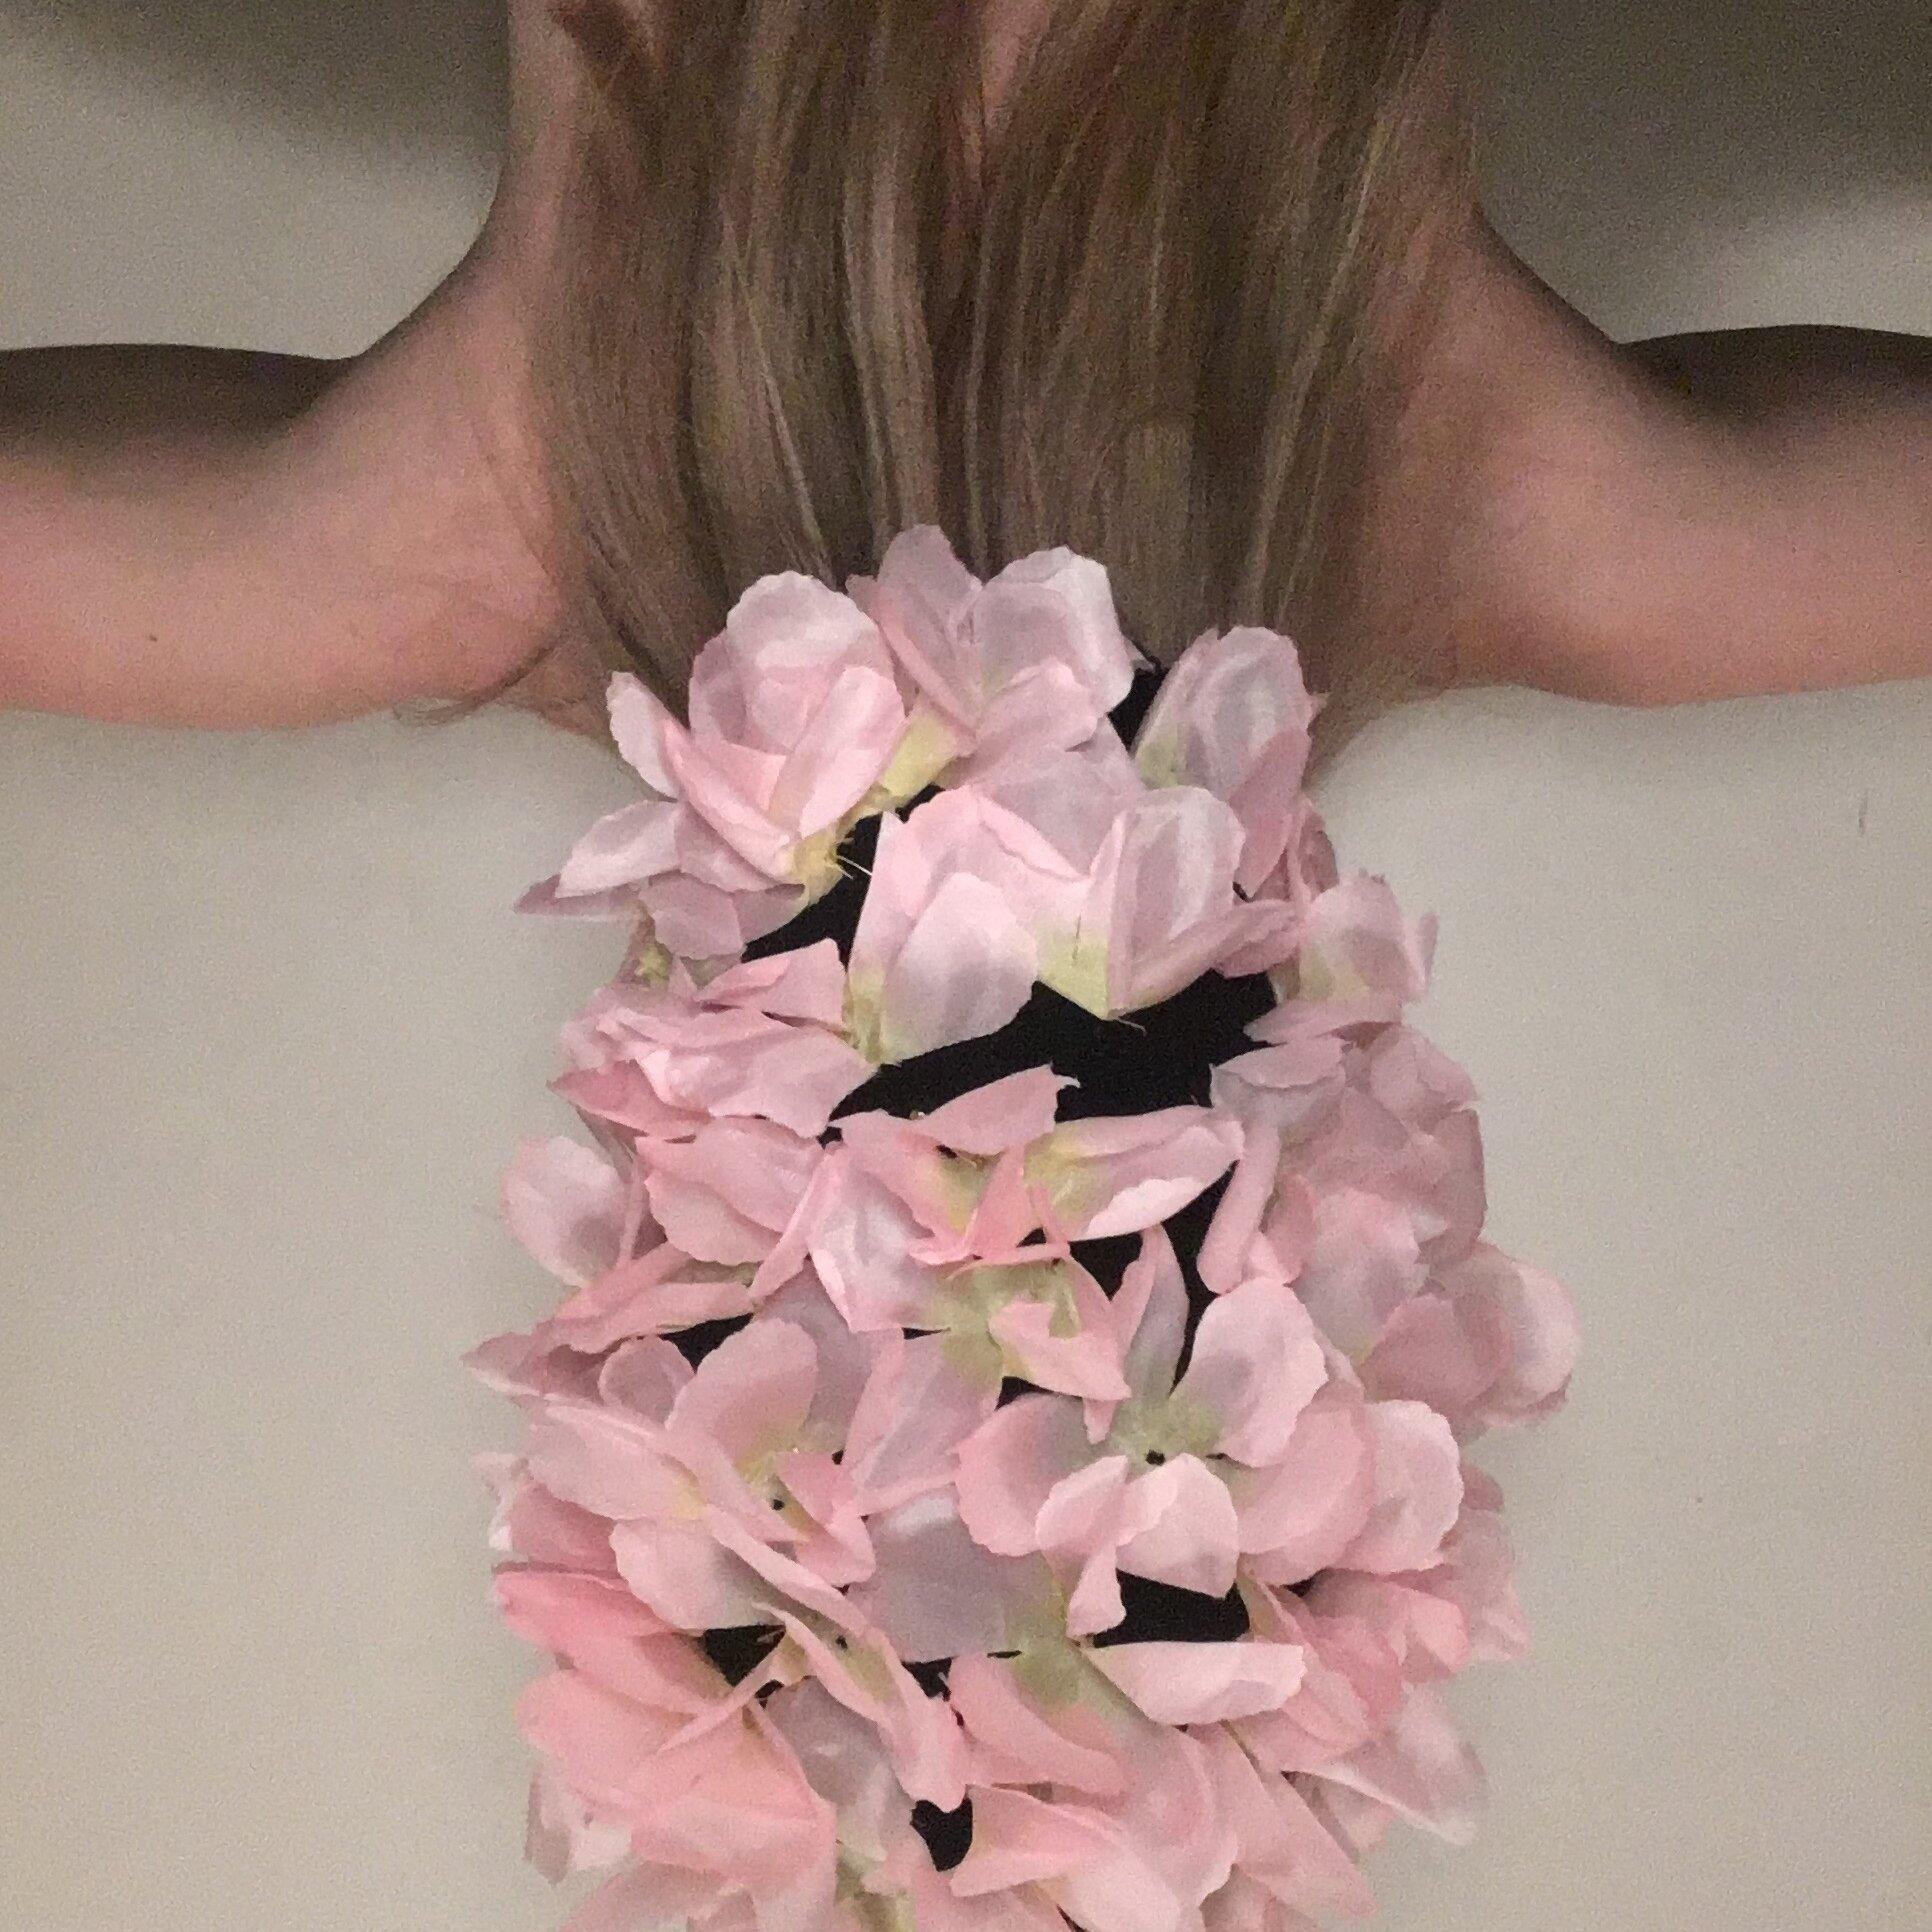 Sofia McItyre copy